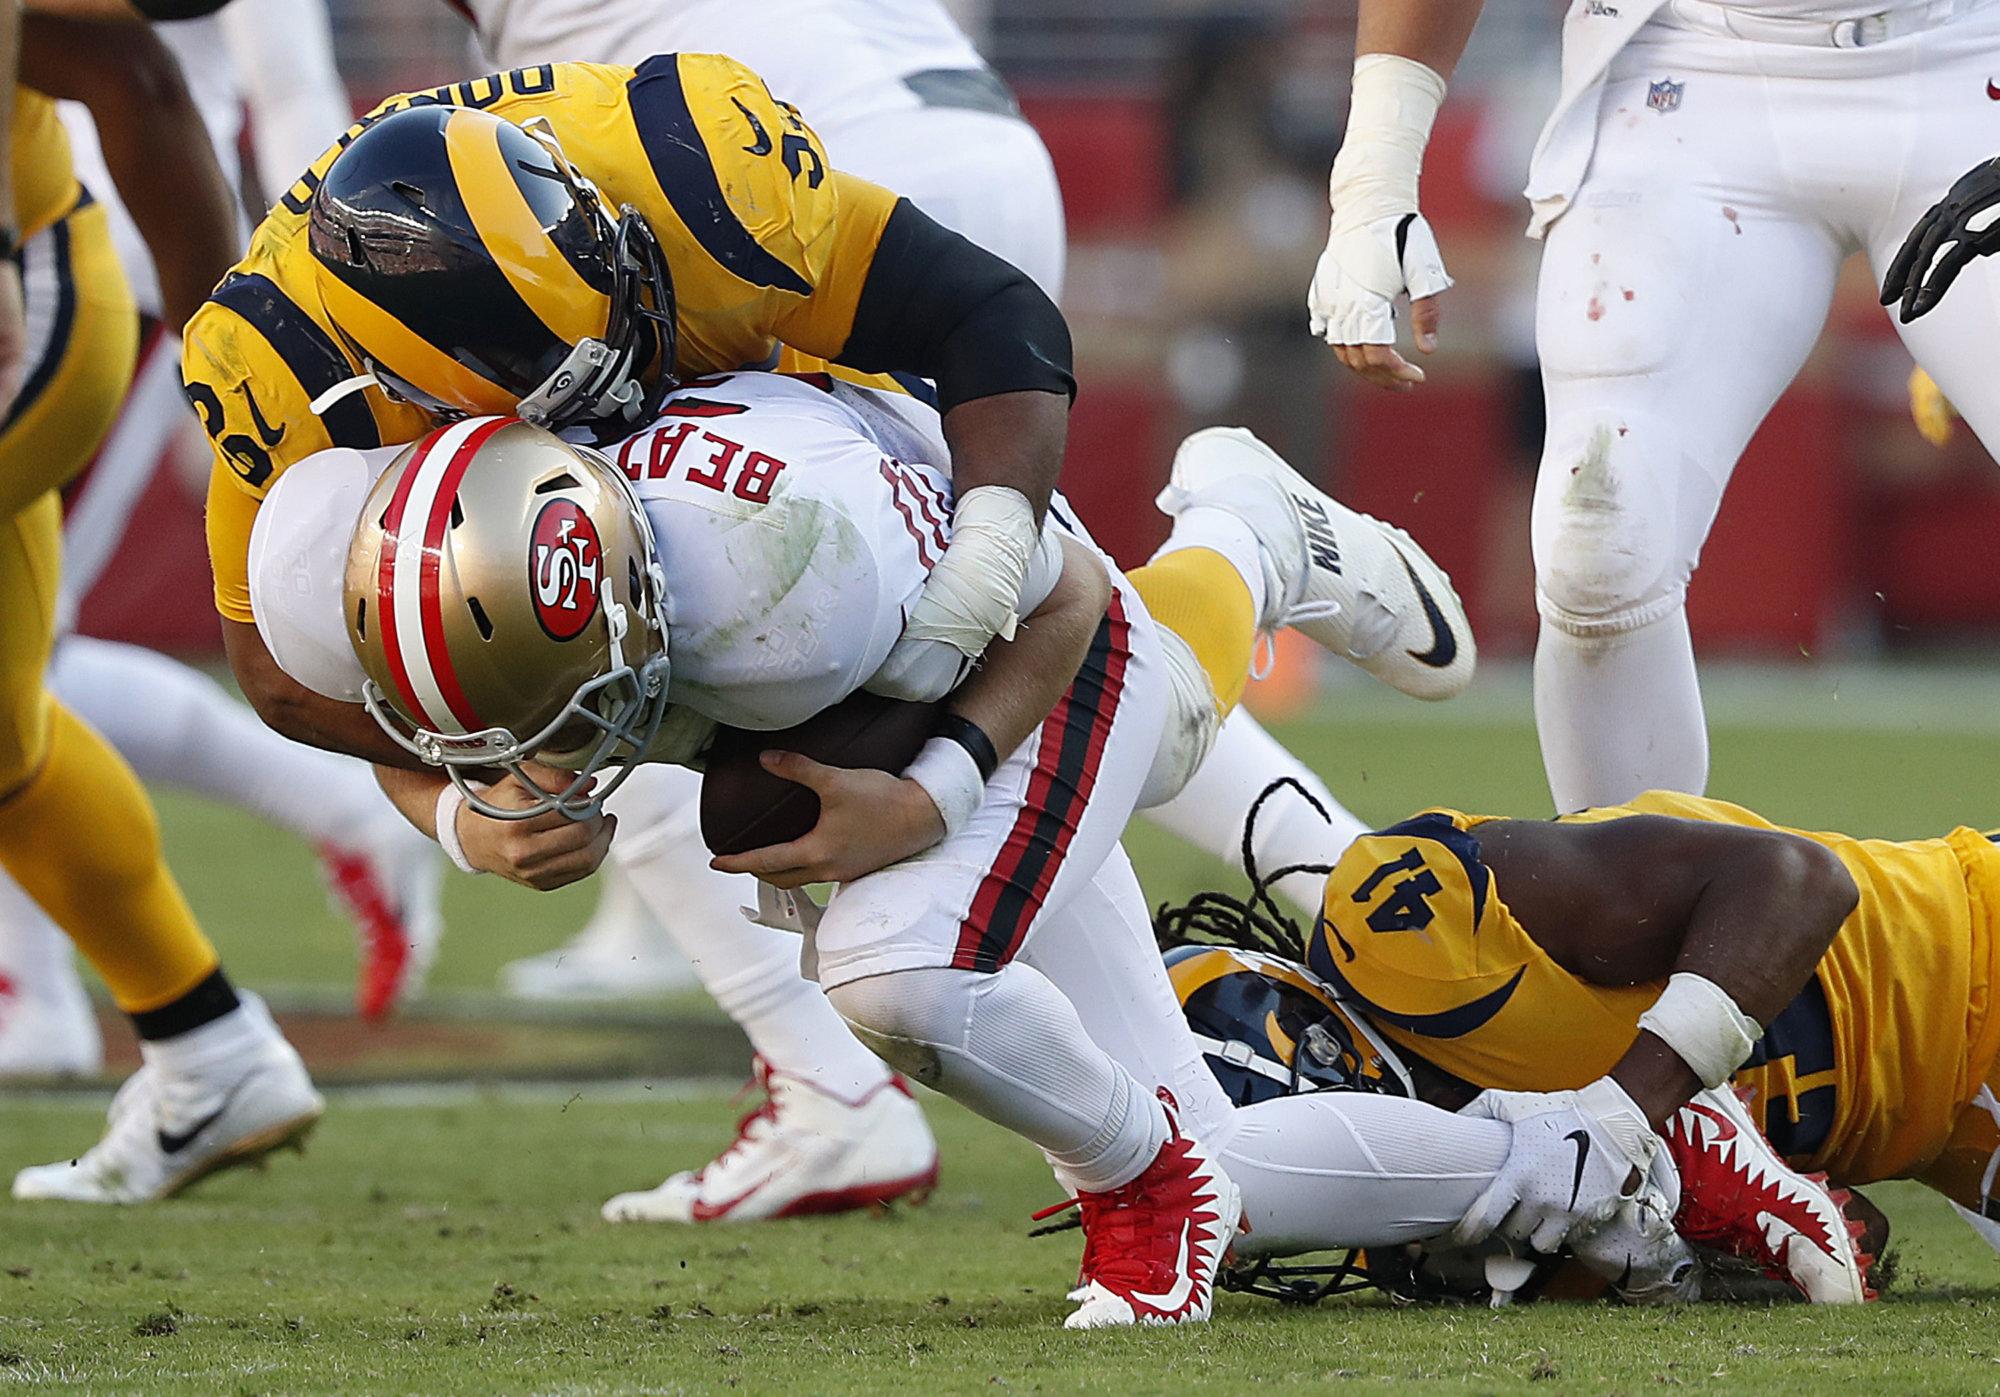 Los Angeles Rams defensive tackle Aaron Donald, top, sacks San Francisco 49ers quarterback C.J. Beathard during the second half of an NFL football game in Santa Clara, Calif., Sunday, Oct. 21, 2018. (AP Photo/Tony Avelar)